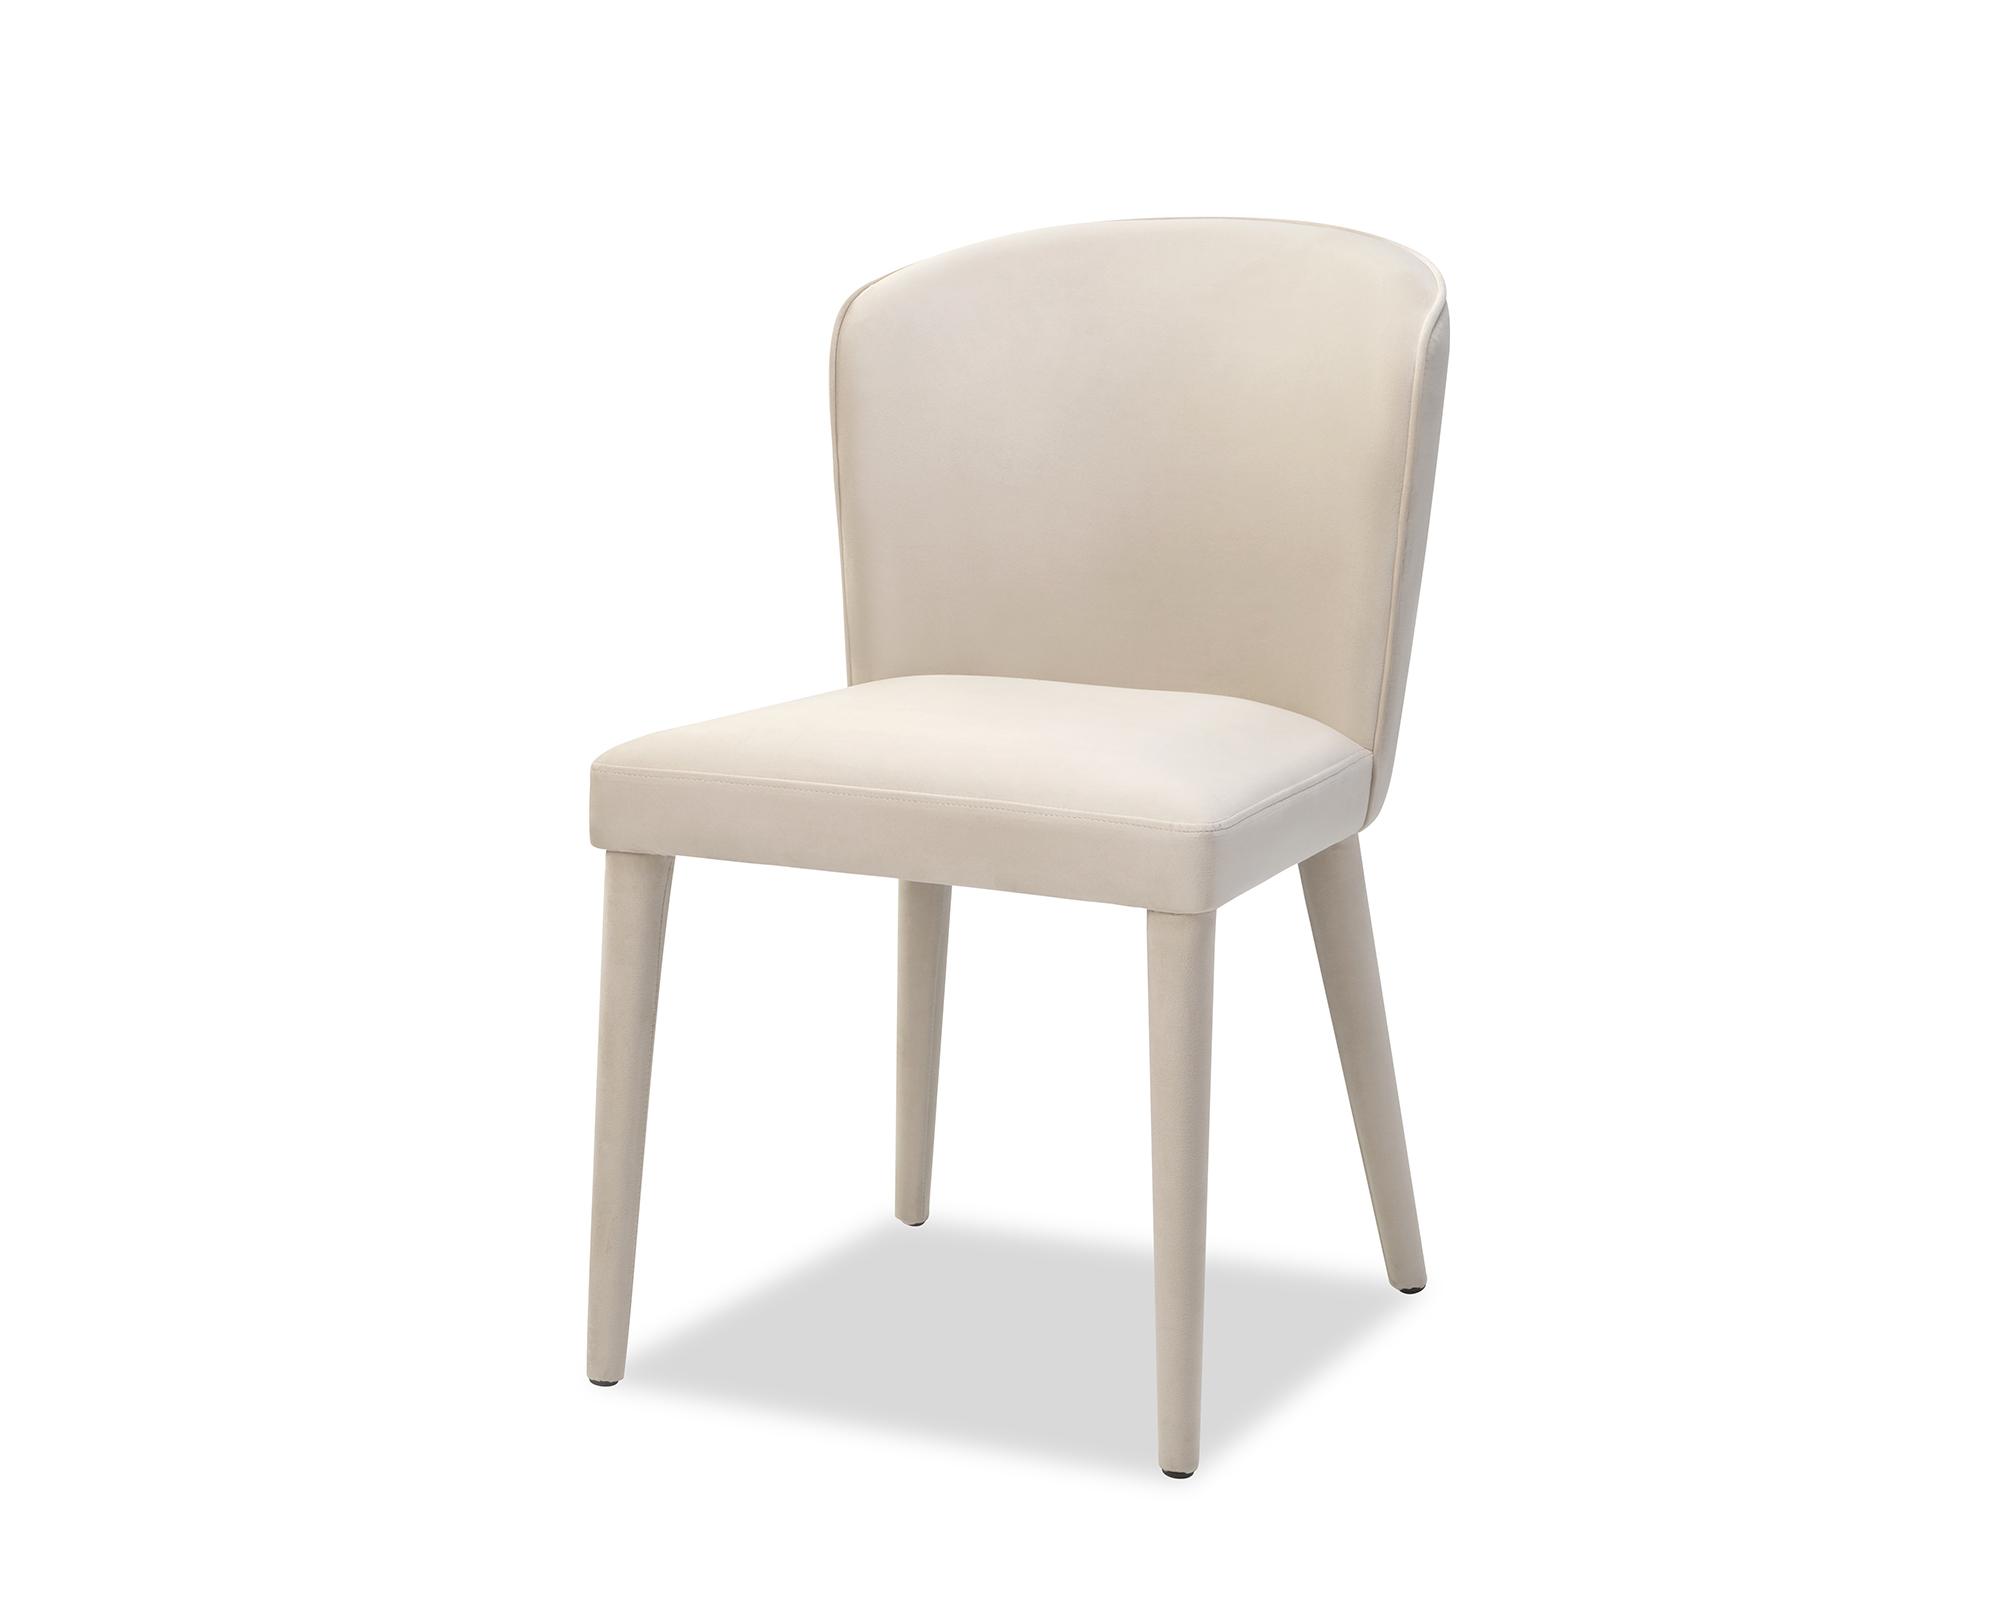 Liang & Eimil Kay Dining Chair Tan Beige Velvet BH-DCH-134 (1)